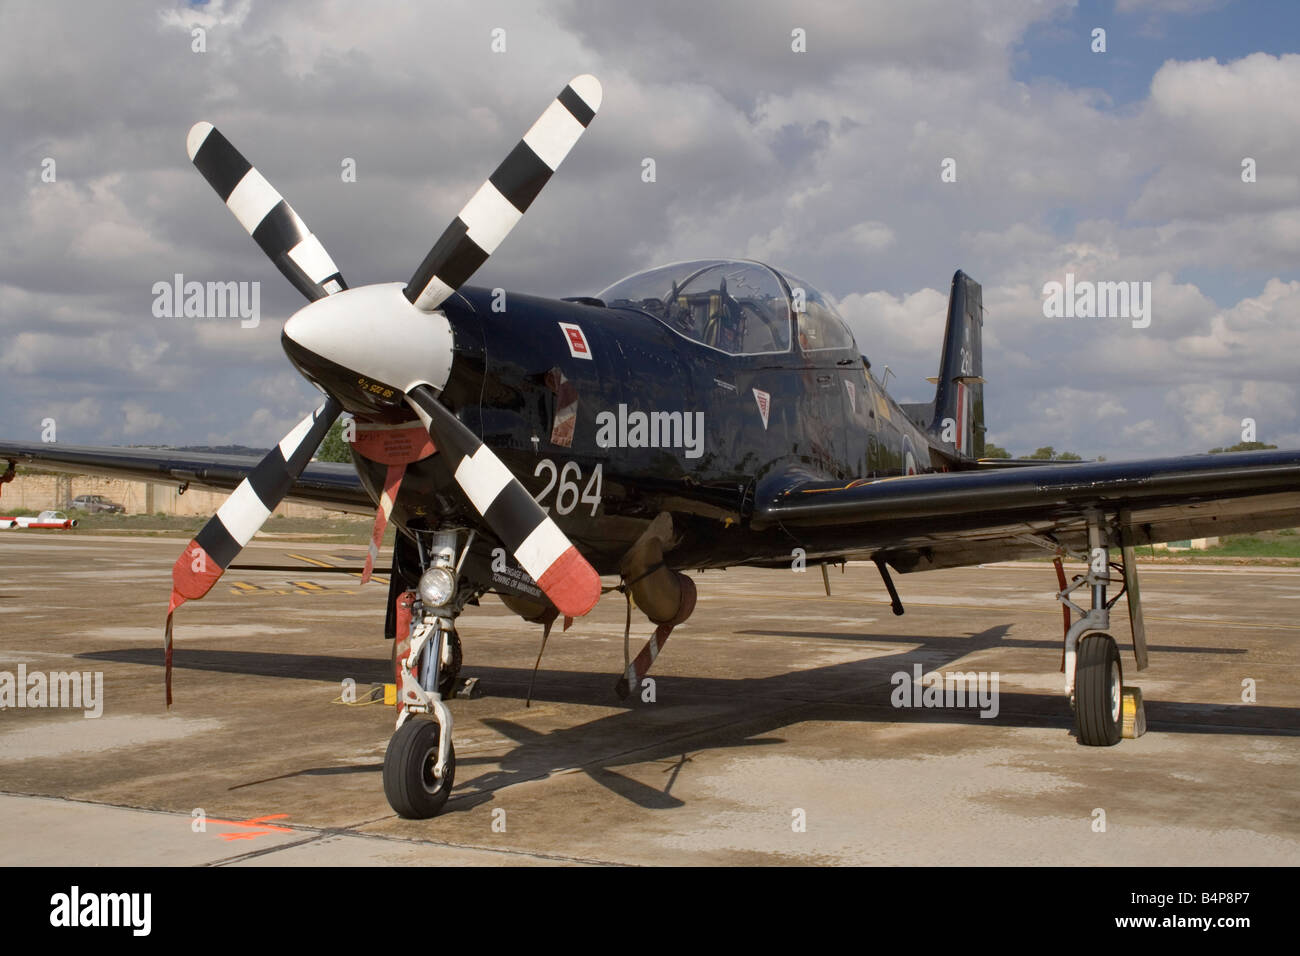 Royal Air Force Shorts Tucano T1 military training plane. Closeup front view. - Stock Image